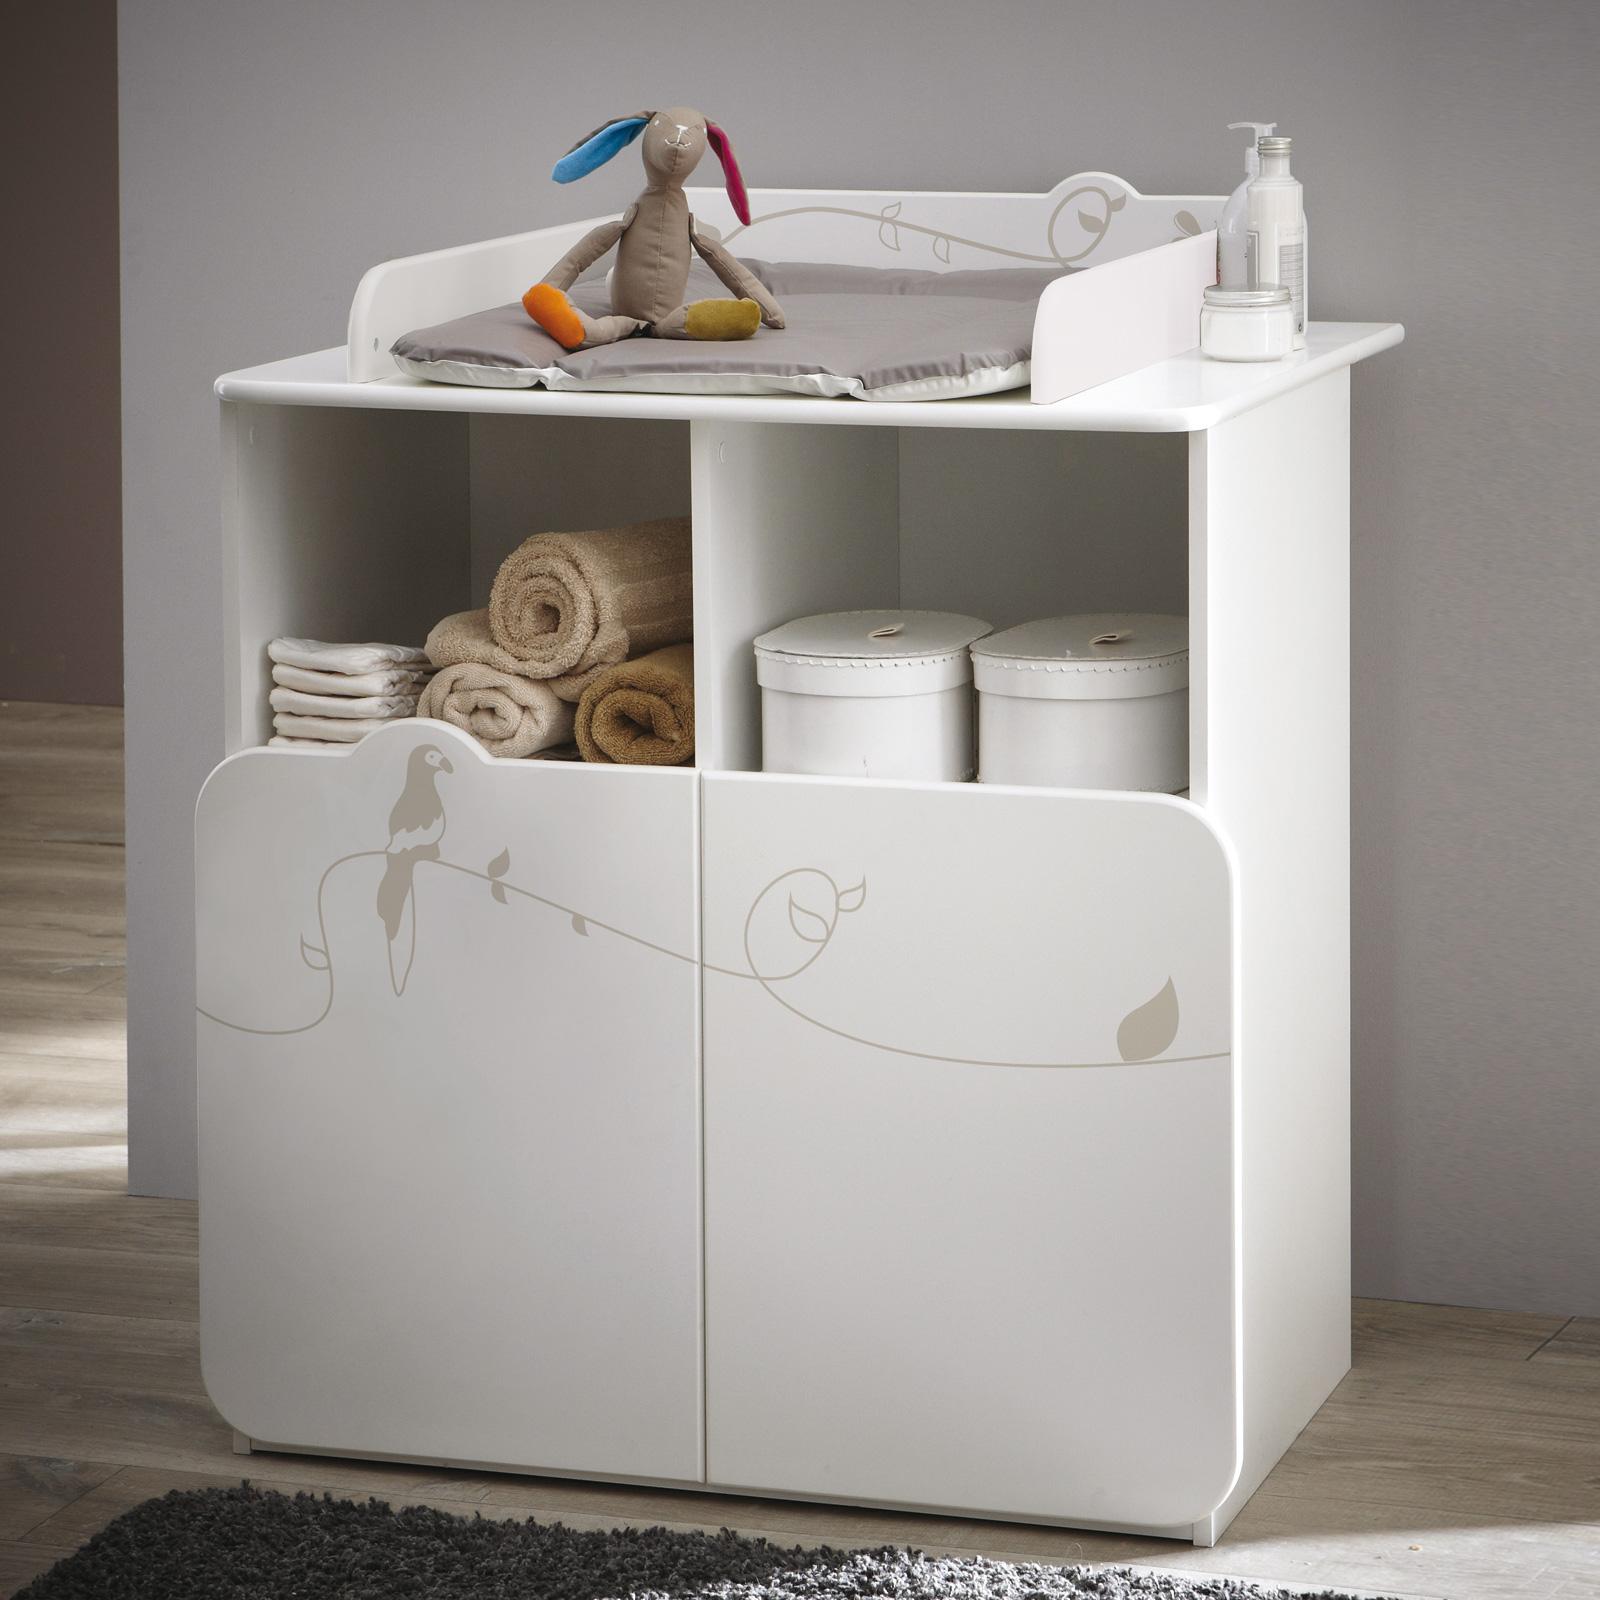 wickeltisch jungle wickelkommode kommode in wei mit. Black Bedroom Furniture Sets. Home Design Ideas